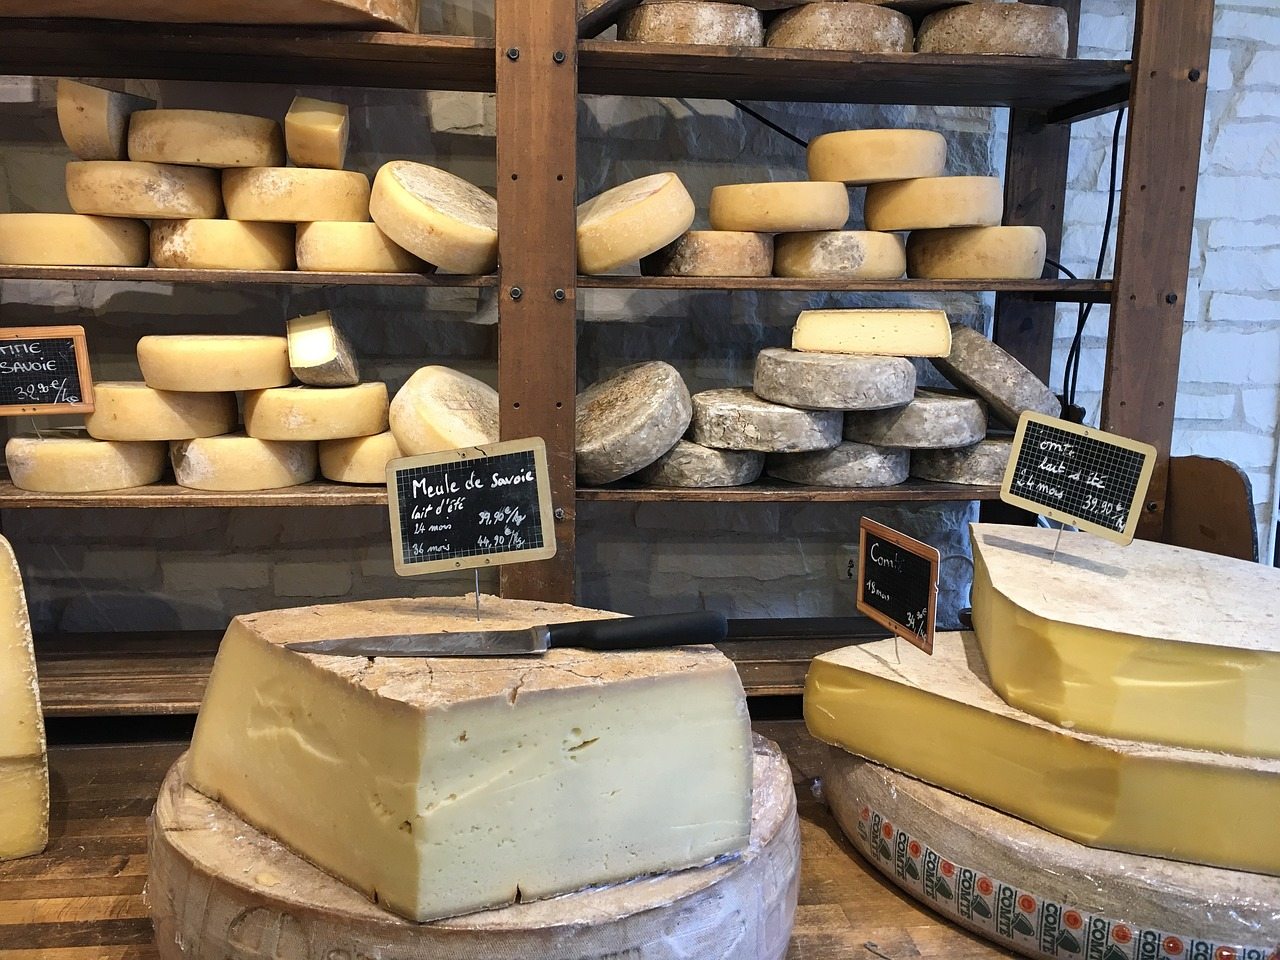 Cheese 2205913 1280